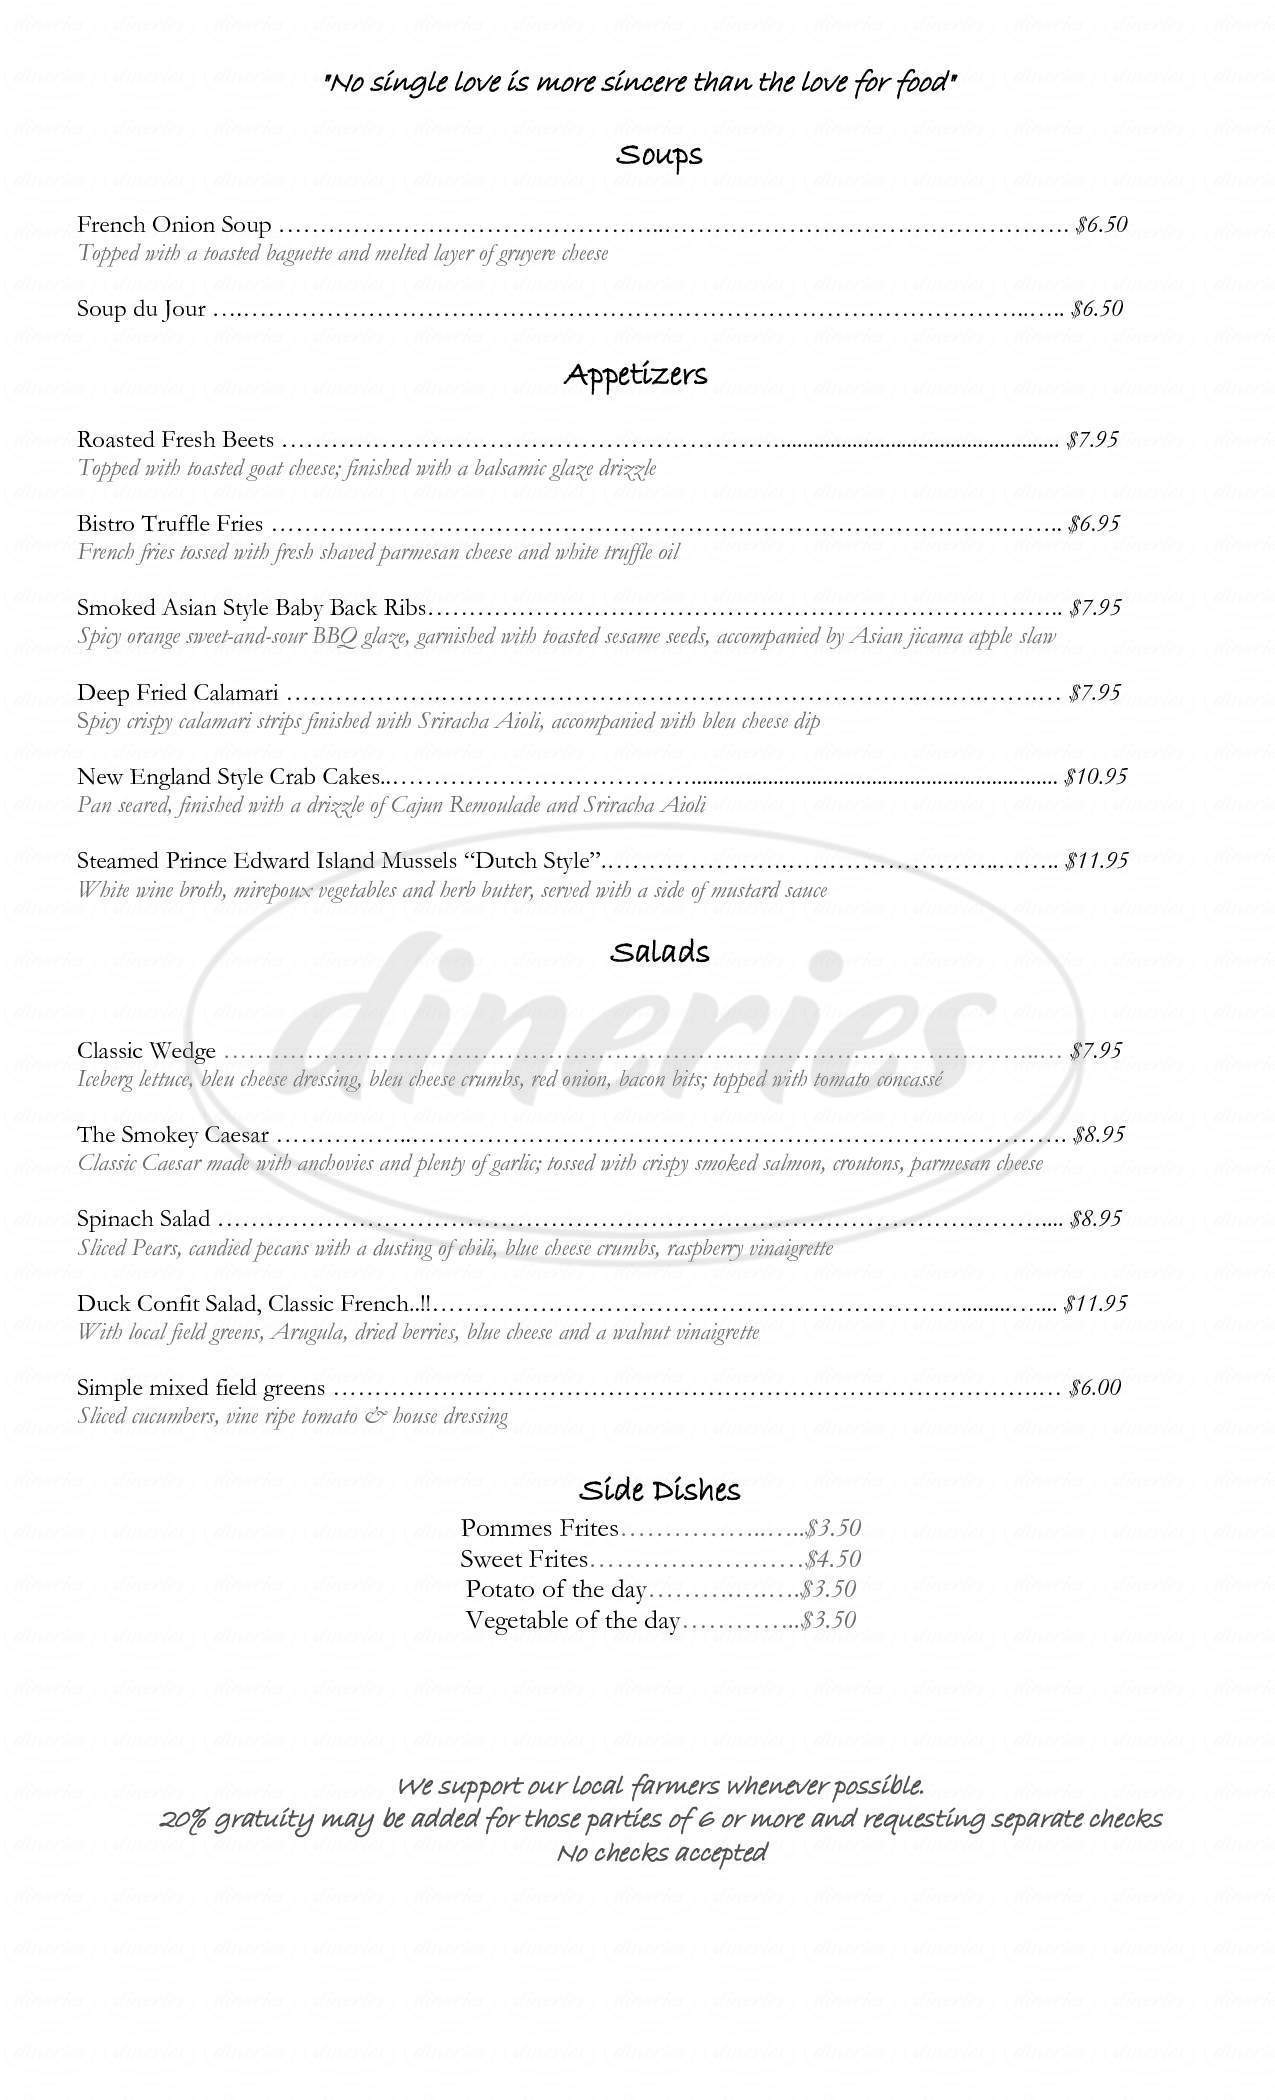 menu for Blades' Bistro